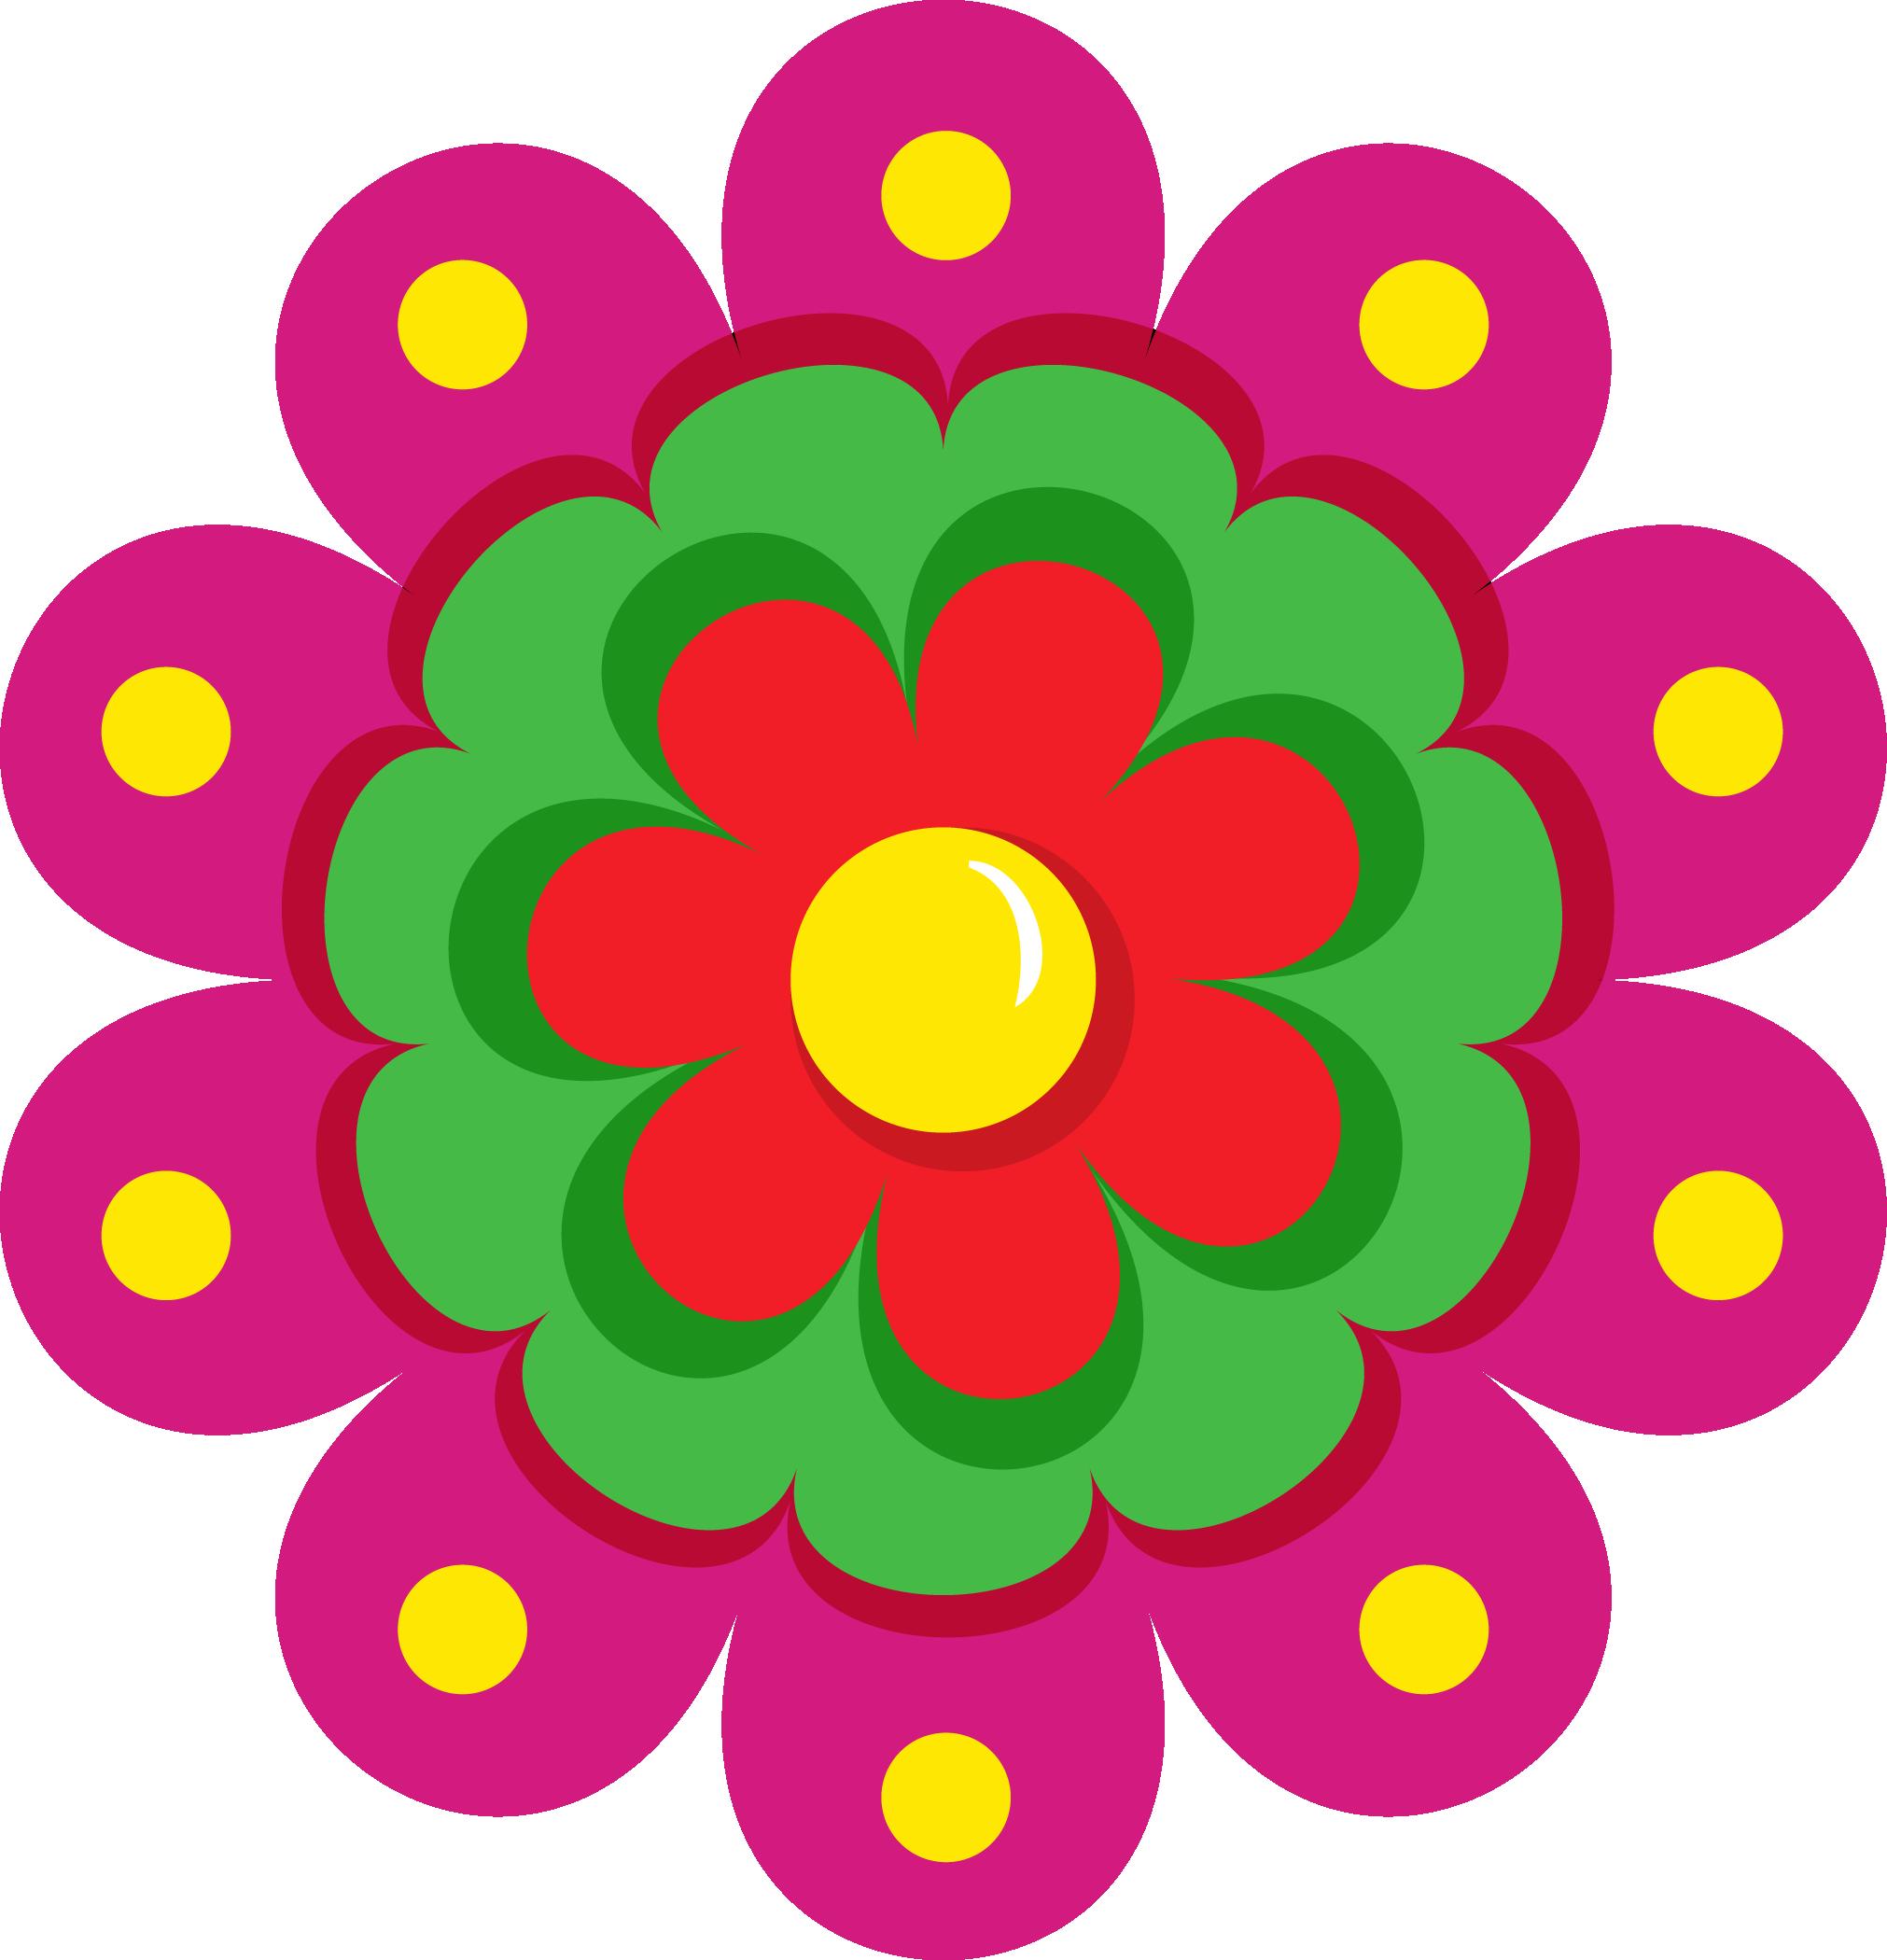 2022x2100 Fiesta Flowers Png